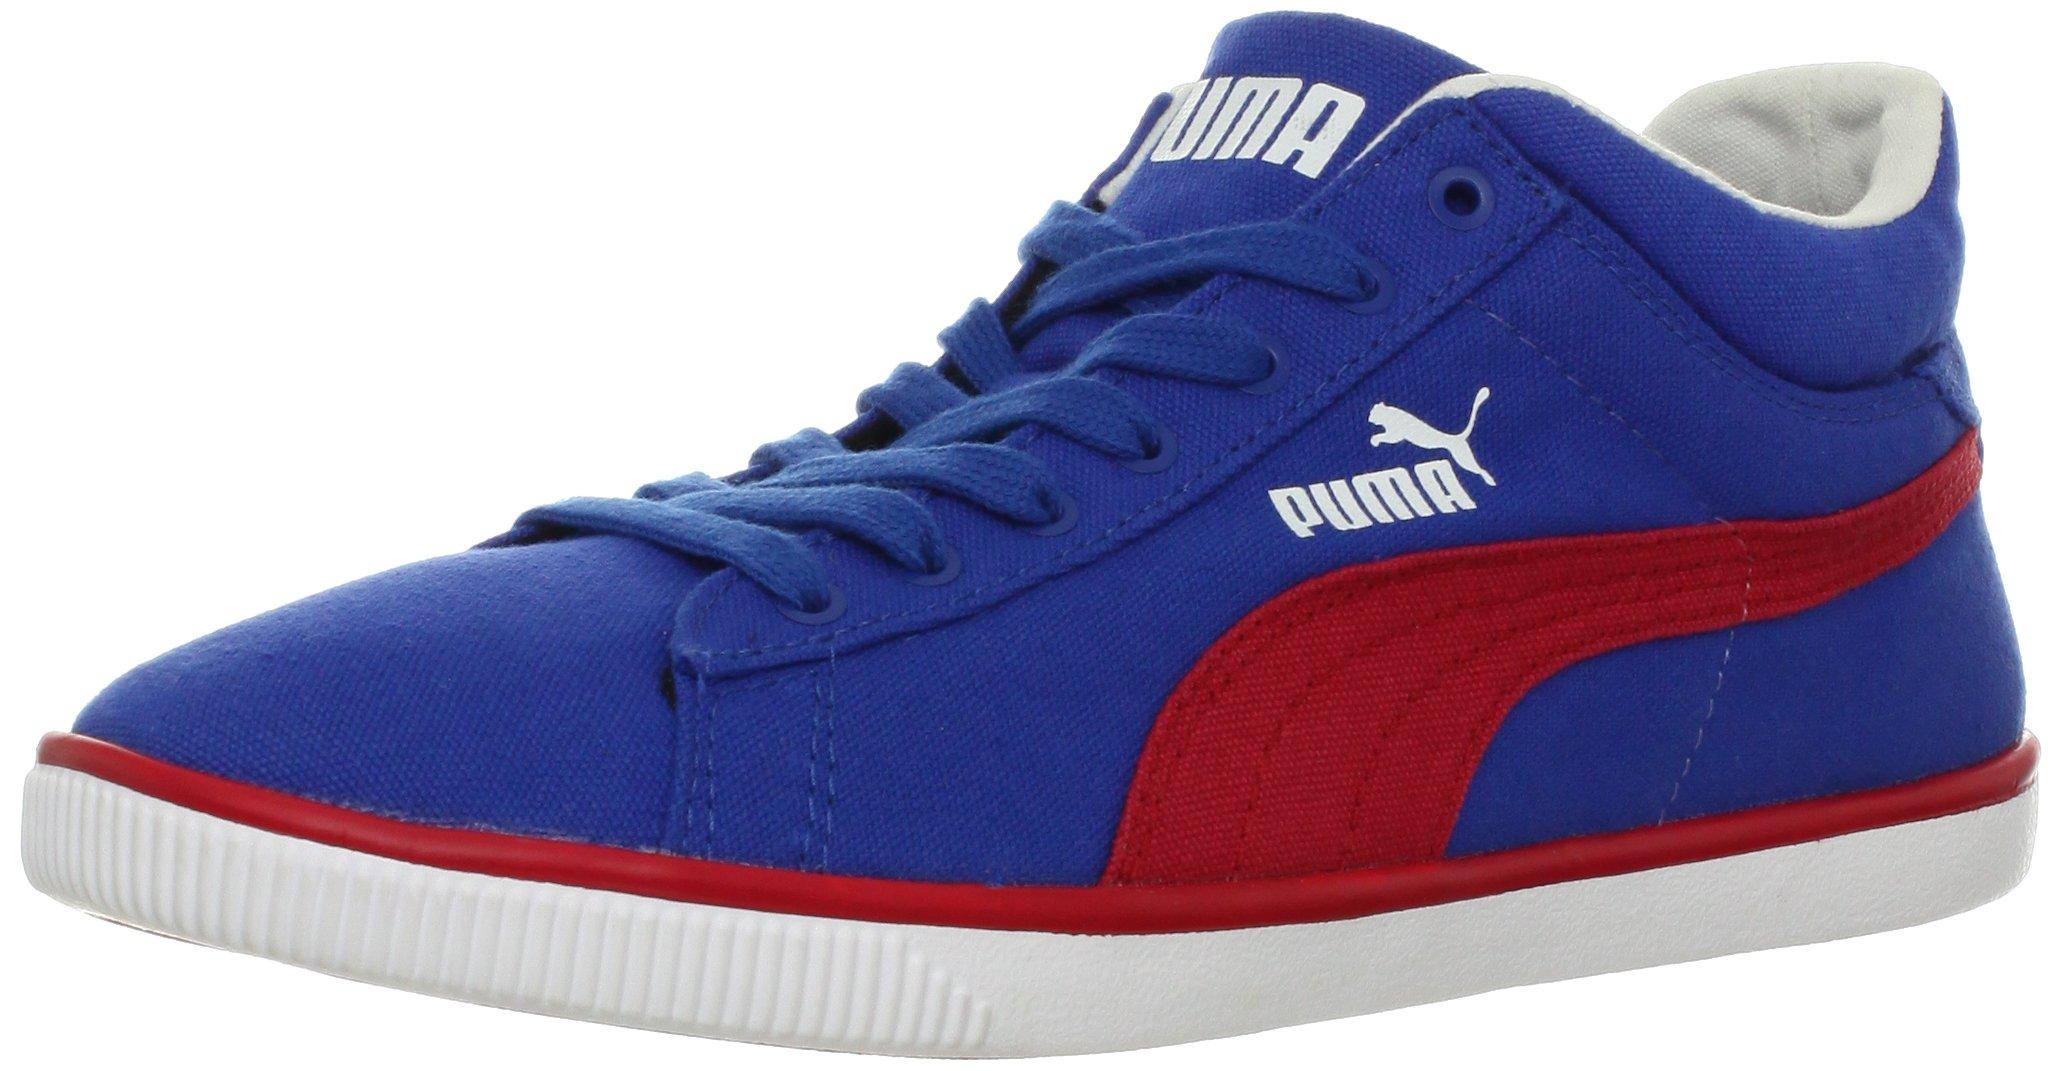 PUMA Glyde Lite Mid Fashion Sneaker,Snorkel Blue/Ribbon Red/White,13 US/14.5 D US